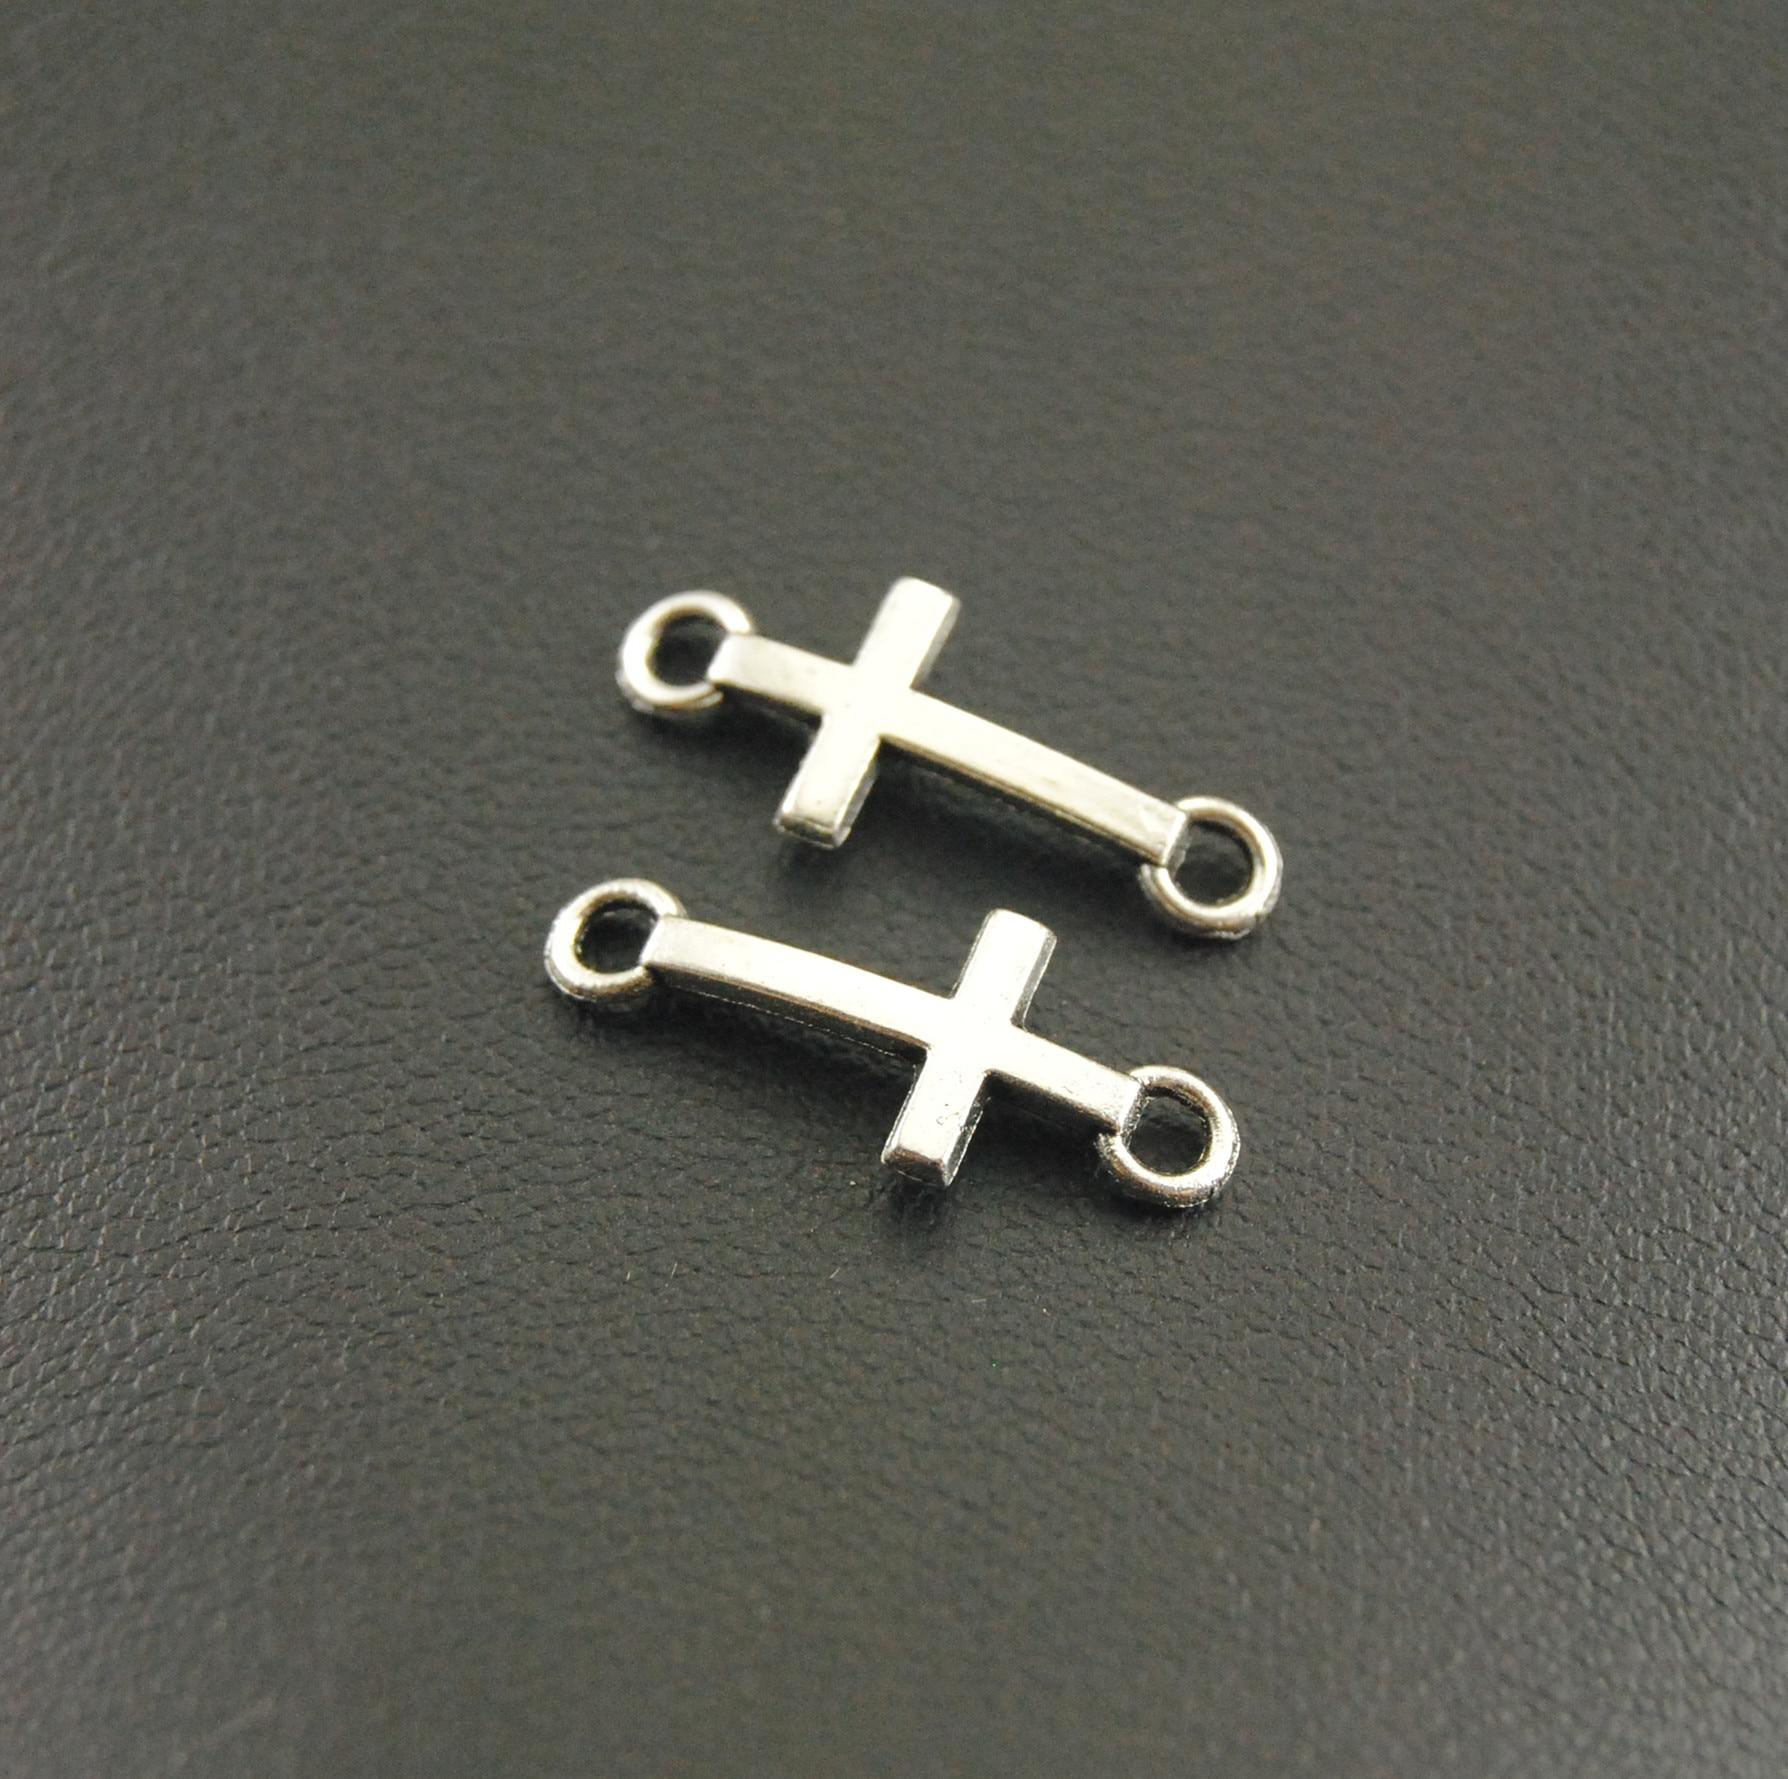 50 Pcs 8x20mm Cross Charms Antique Silver Sideways Mini Cross Charm/Pendant Diy Bracelet A1165